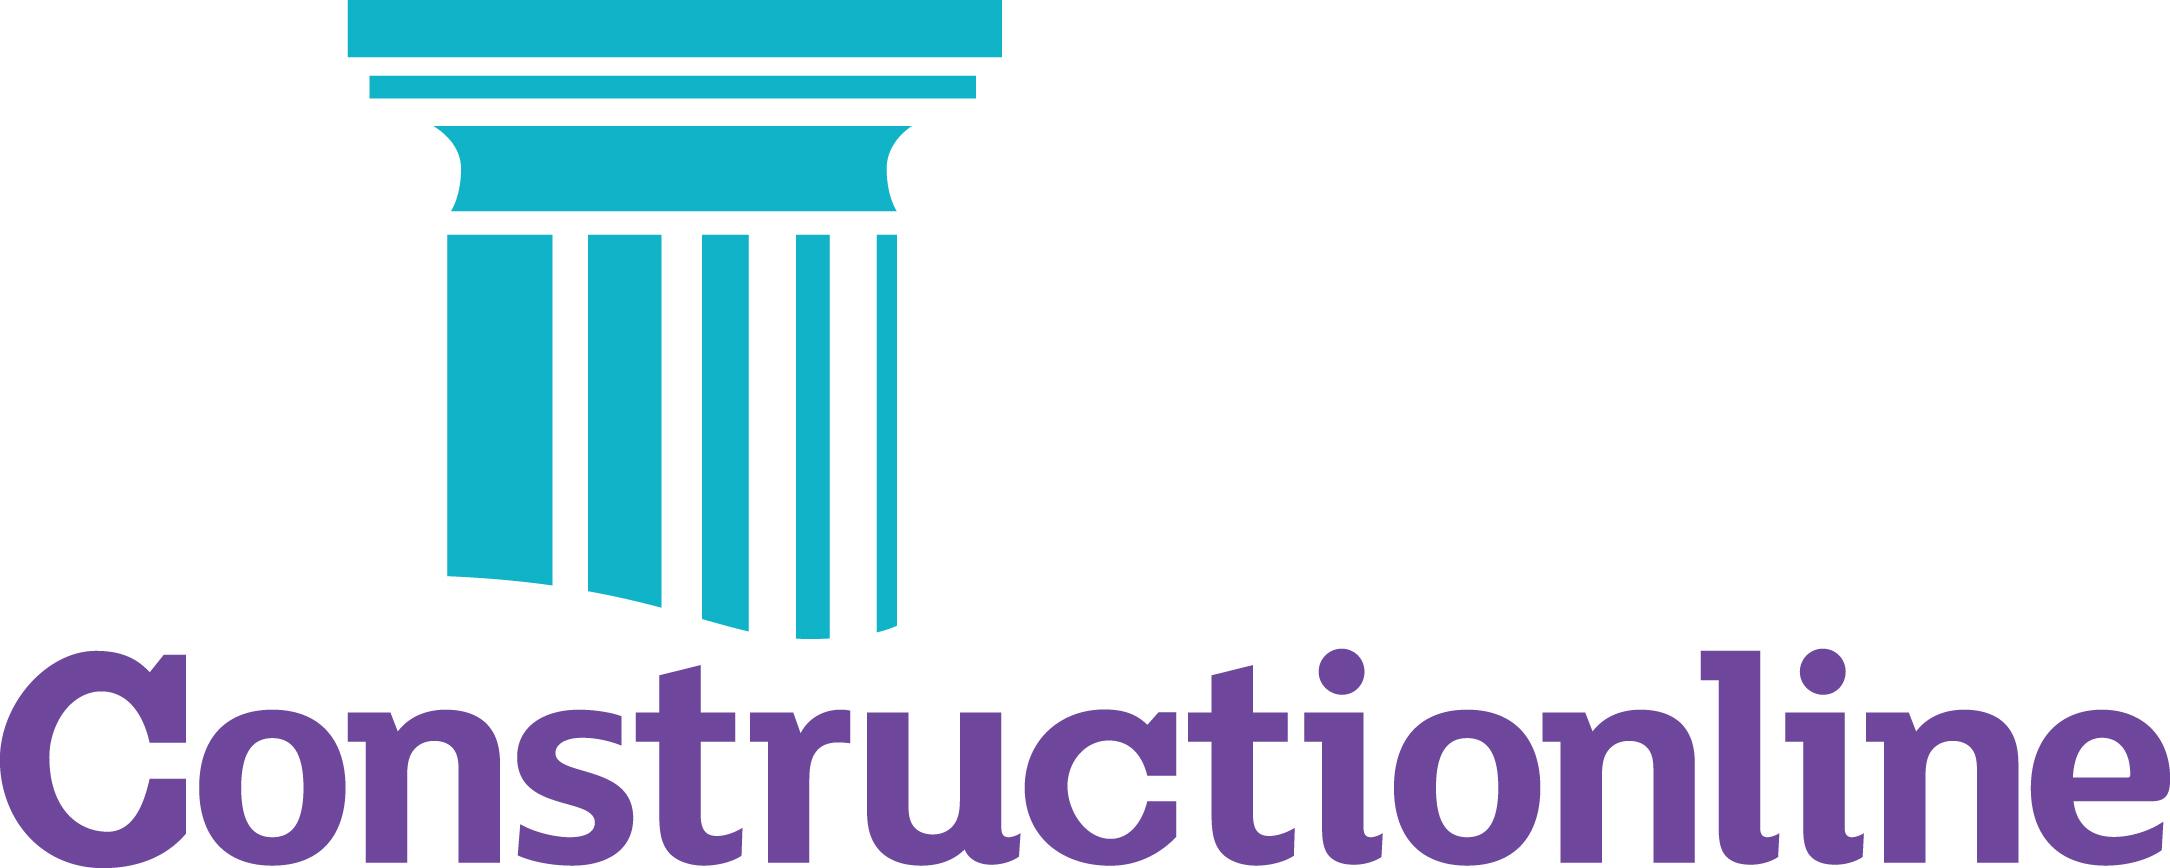 Constructionline_New_CMYK